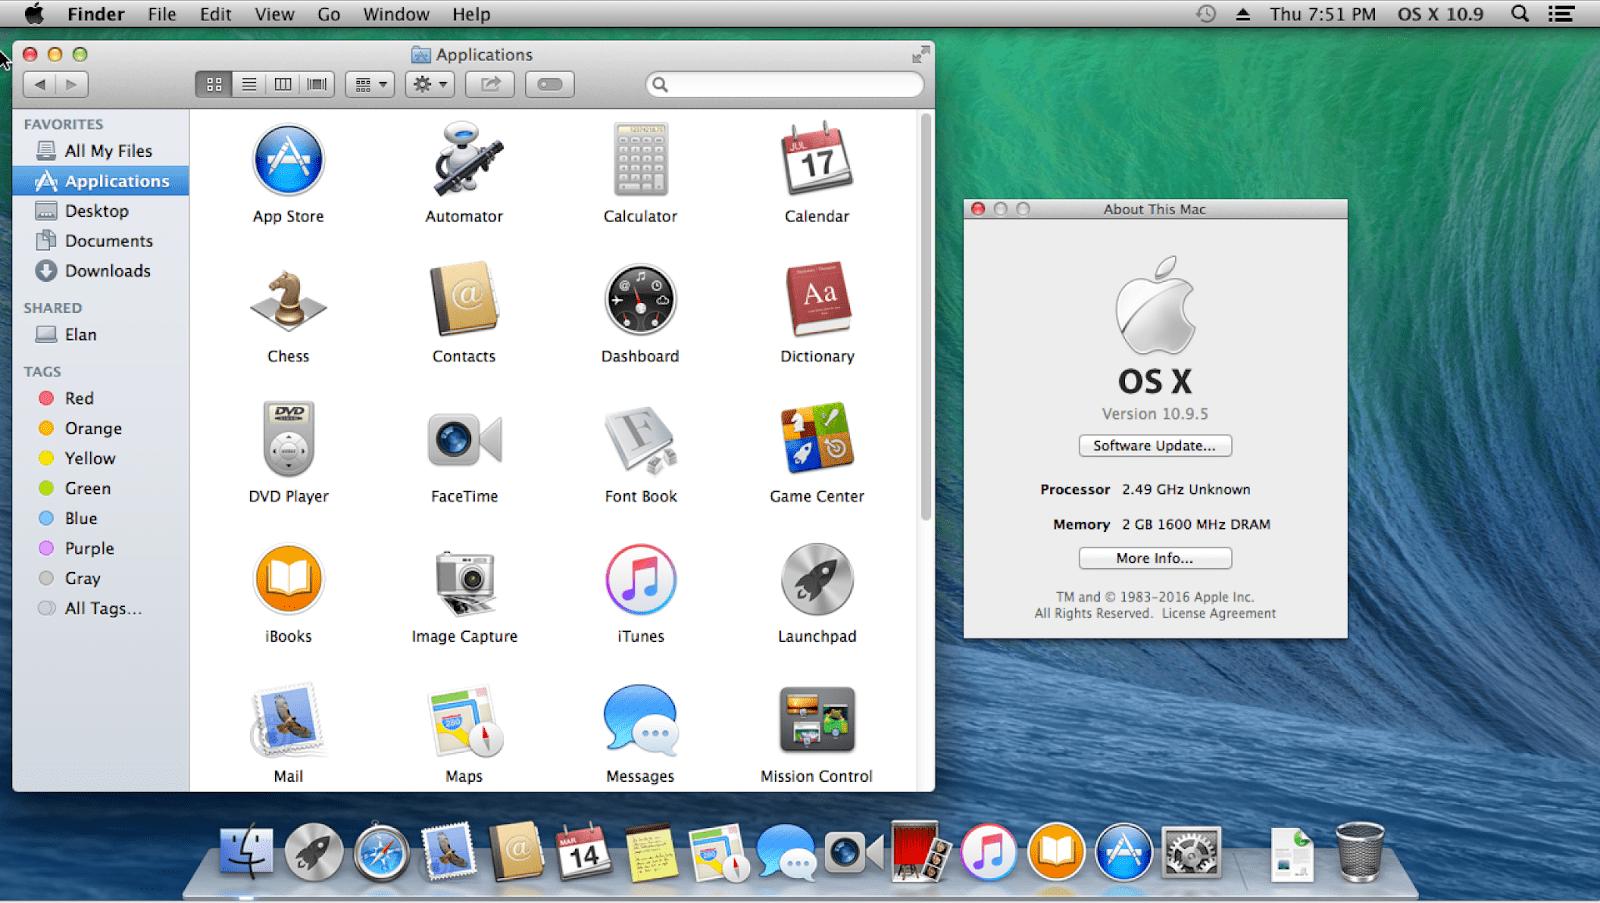 OS X 10.9 (Mavericks)